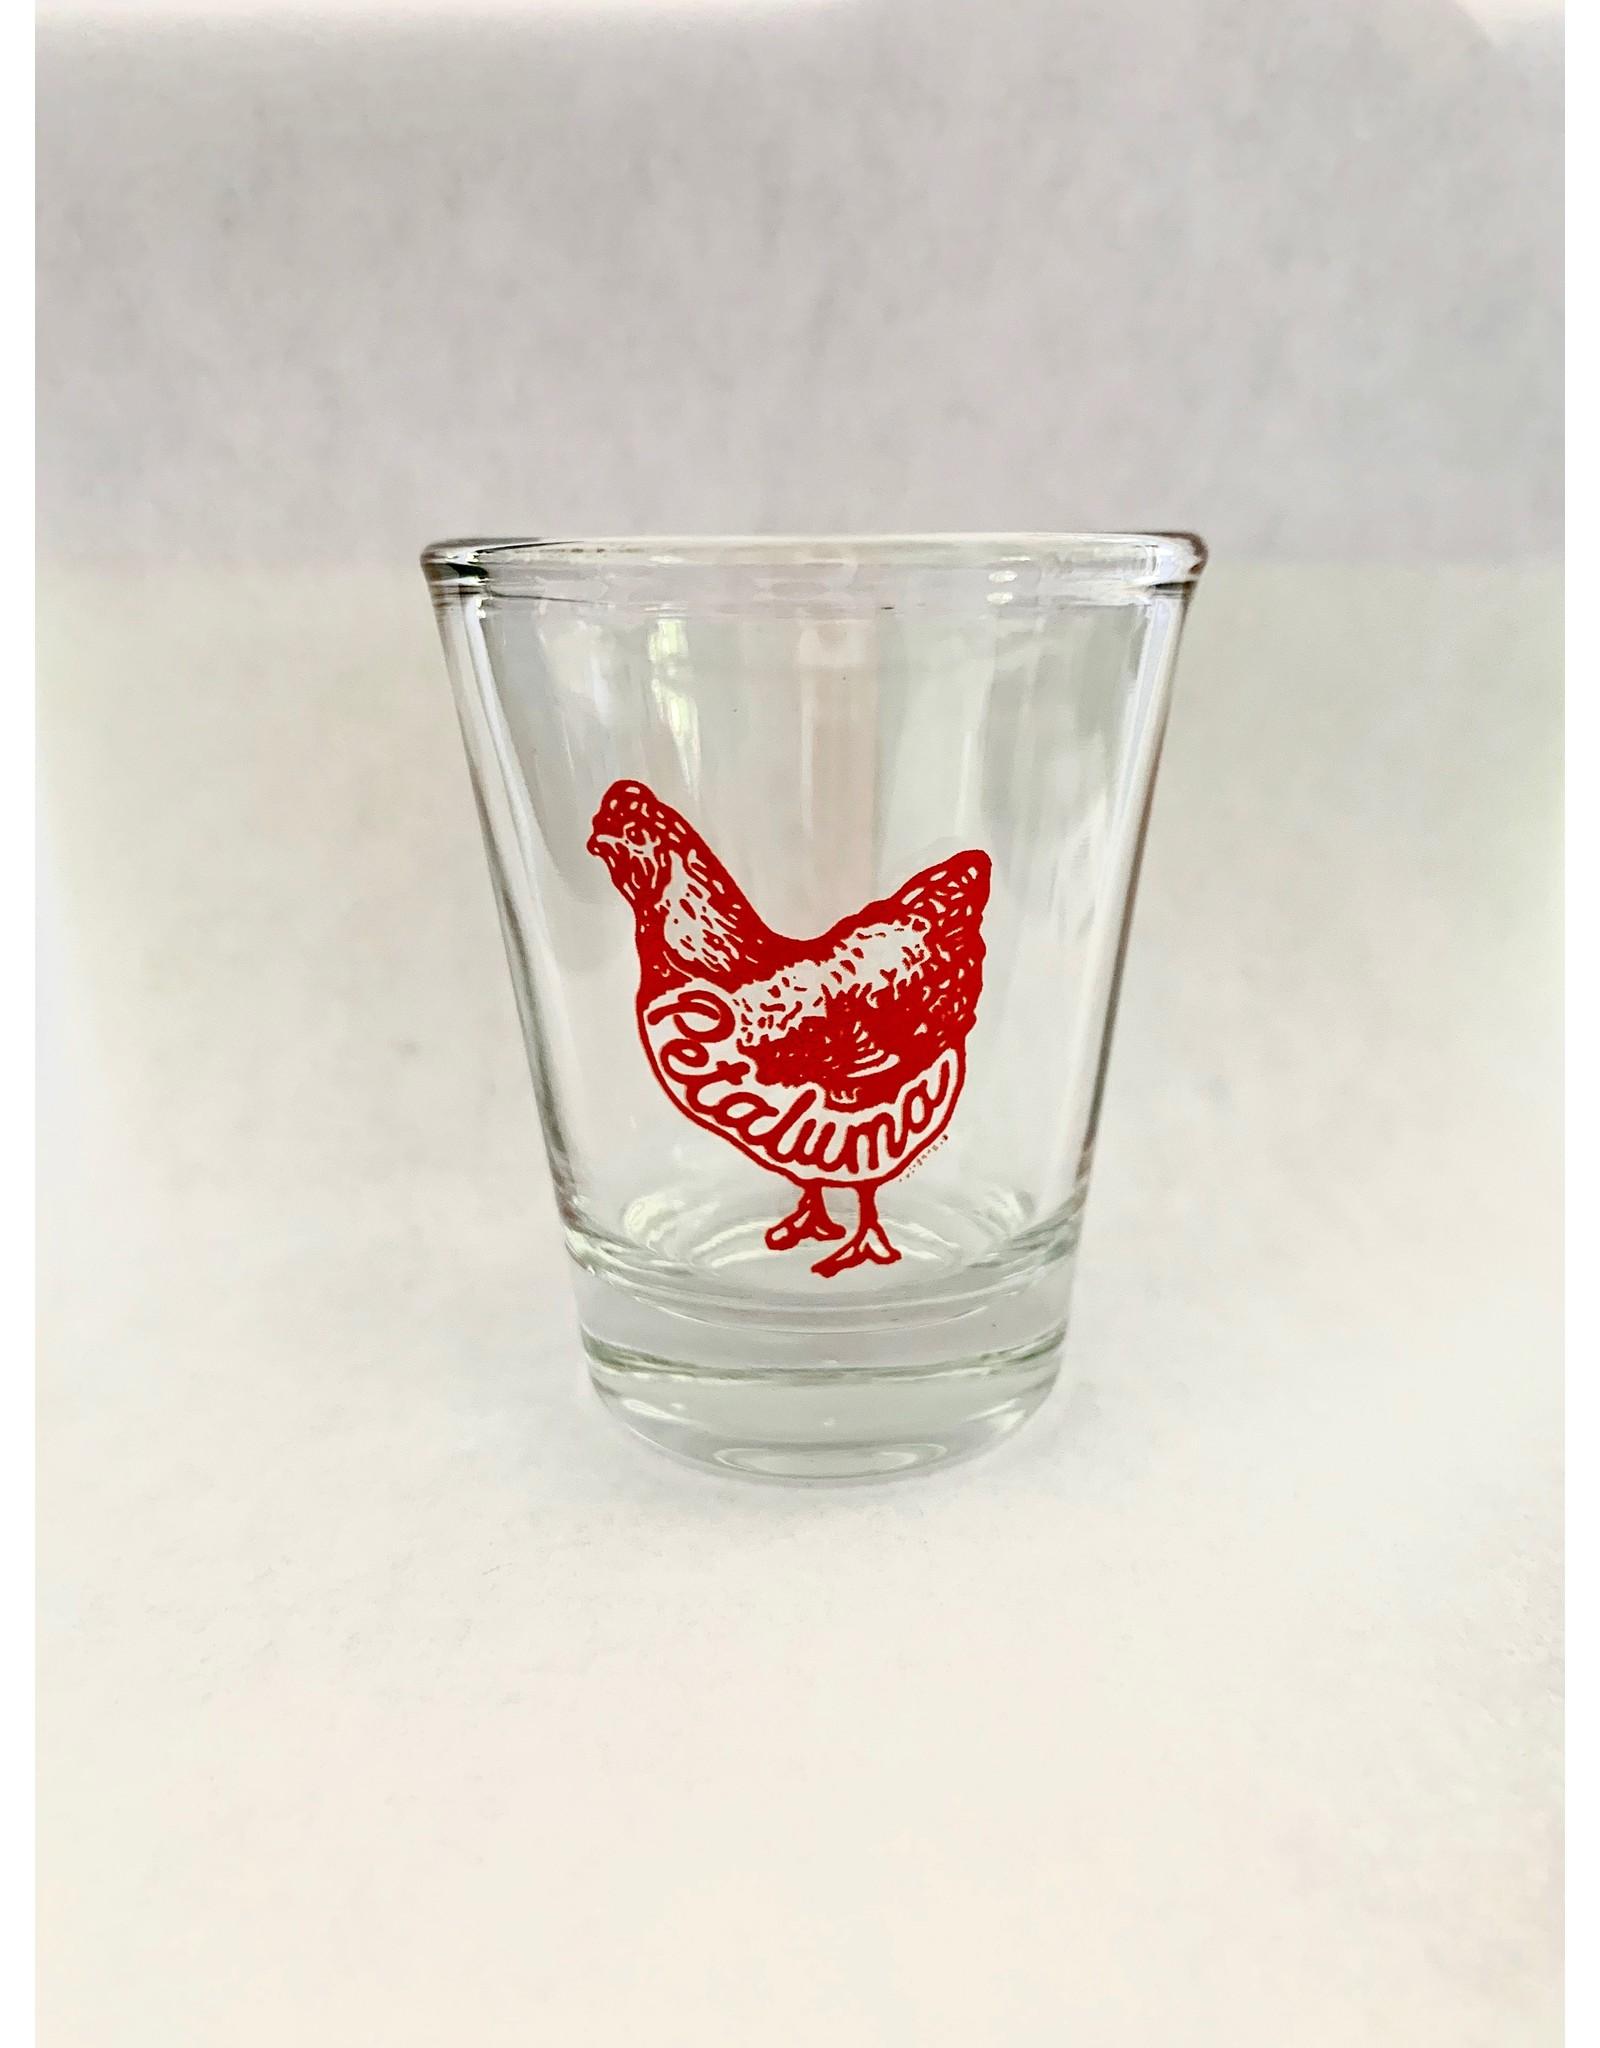 Blockhead Press Petaluma Shot Glass